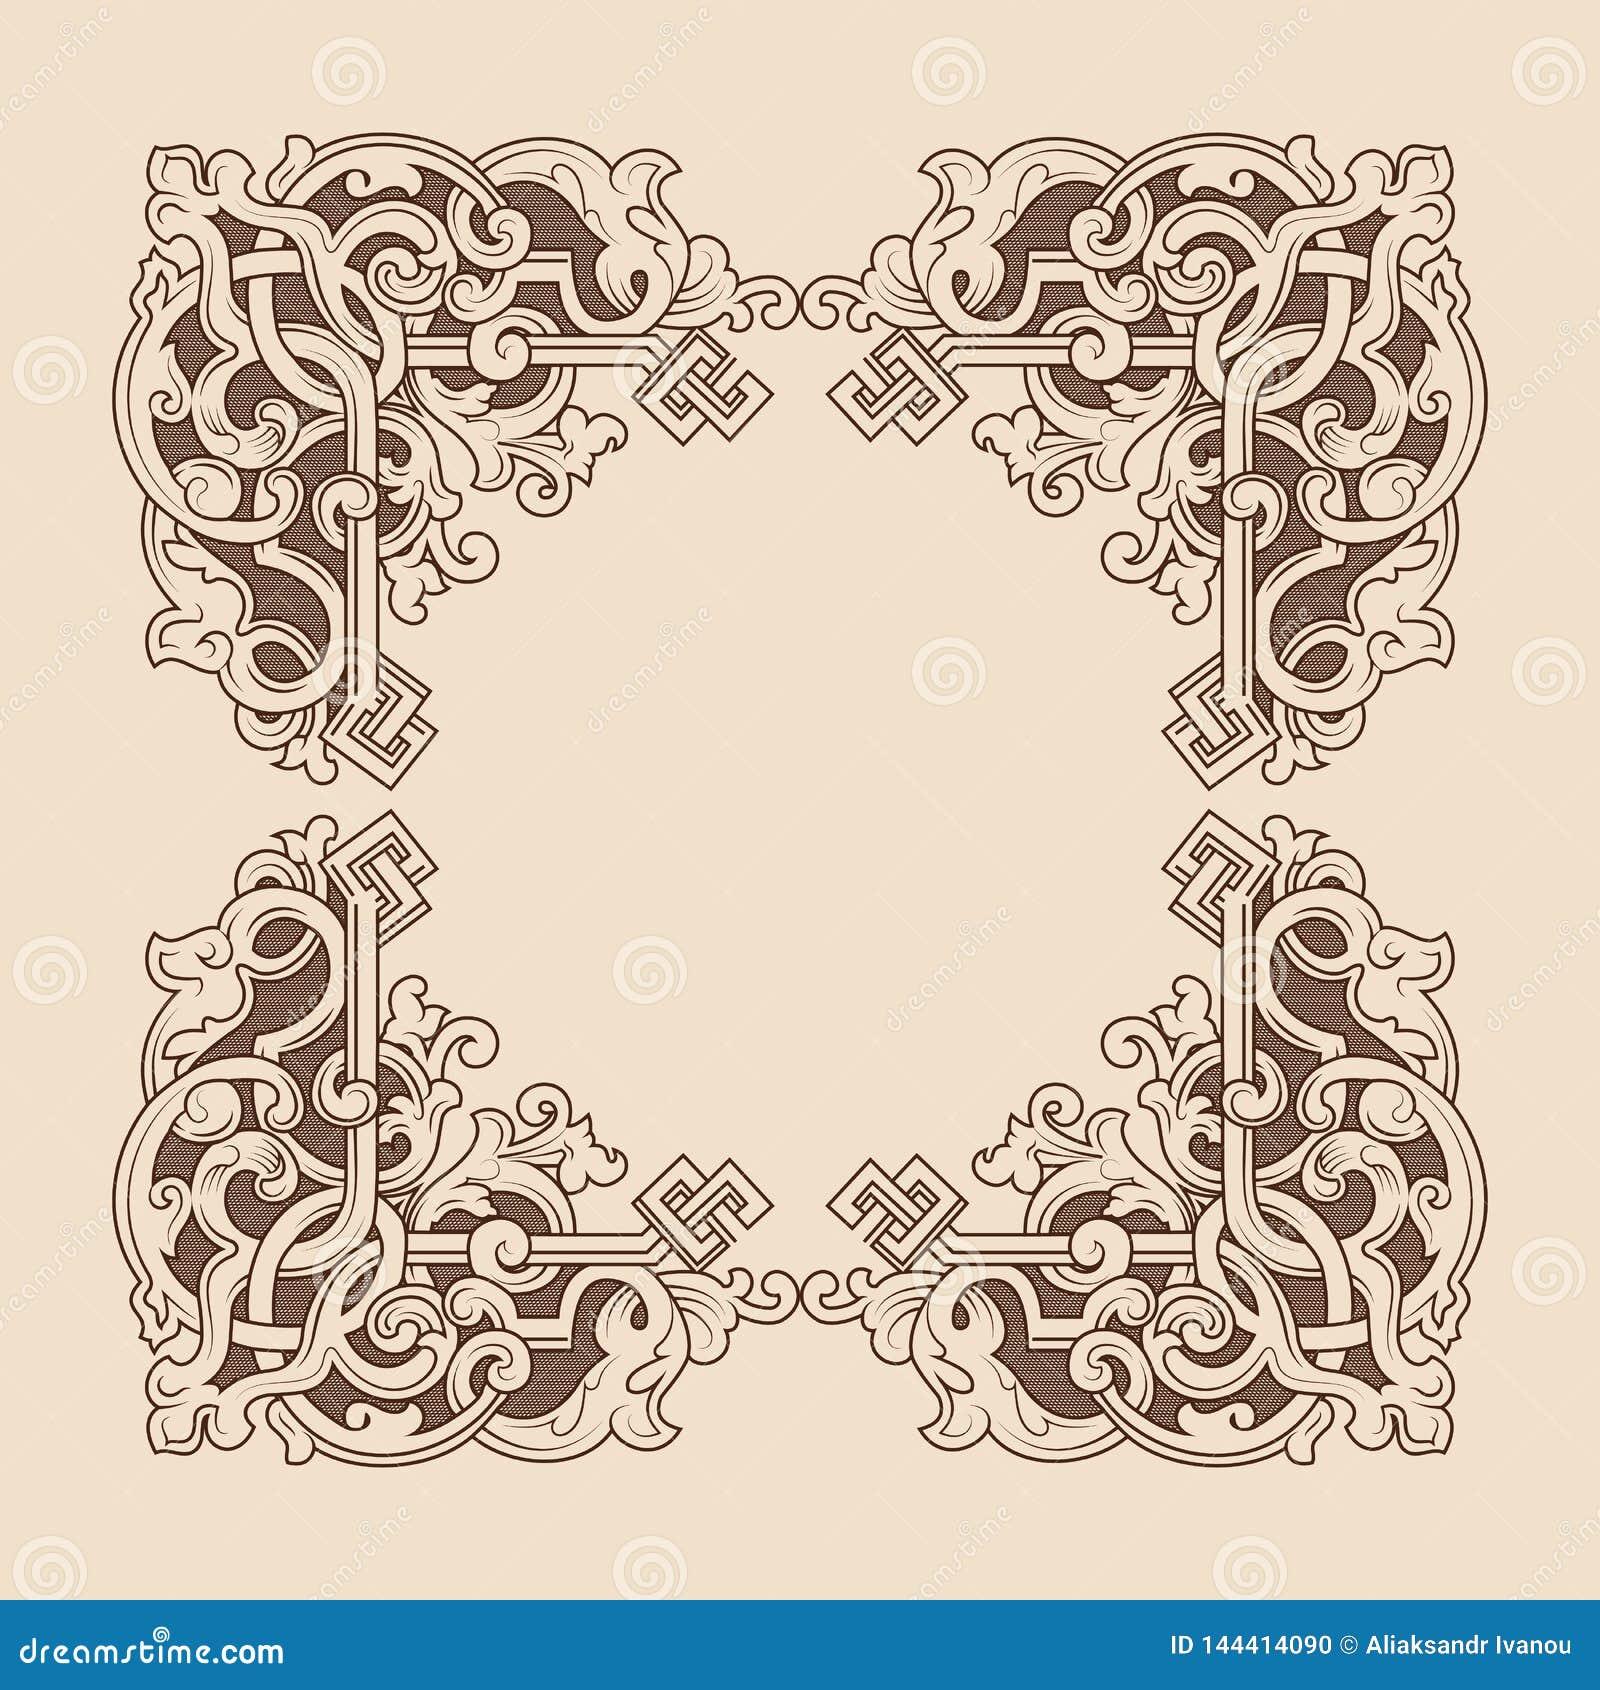 Decorative frame with art ornament. Vector illustration. Vintage design elements corners